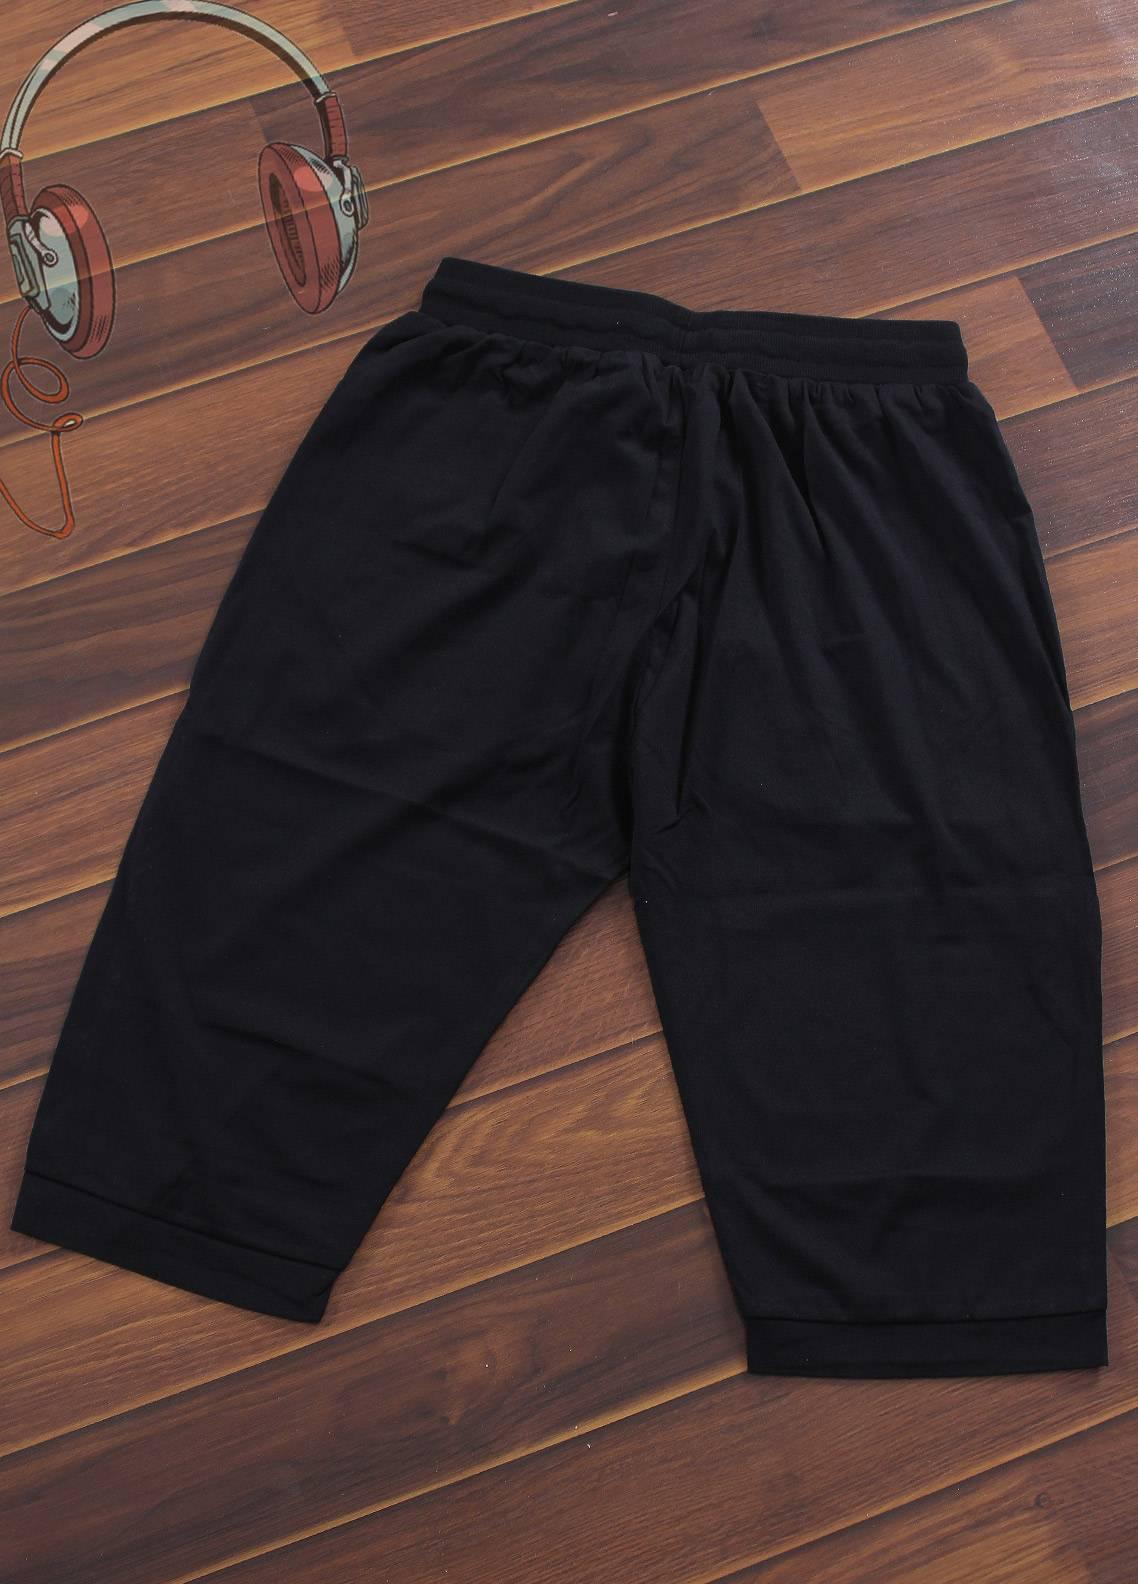 Sanaulla Exclusive Range Jersey Casual Shorts for Boys -  3942-Black